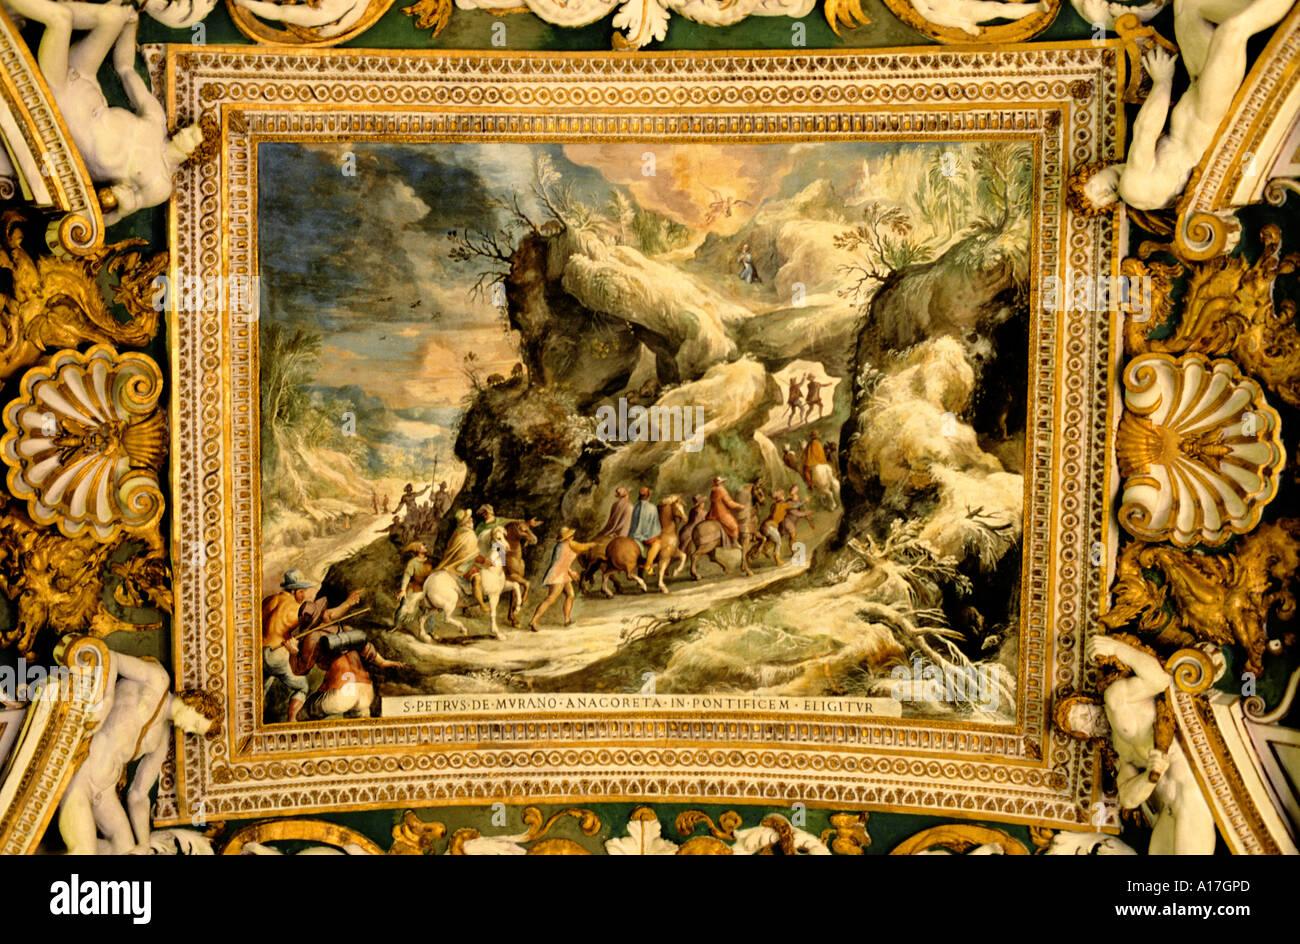 Vatican Fresco painting wall Rome Italy art Stock Photo: 5811052 - Alamy